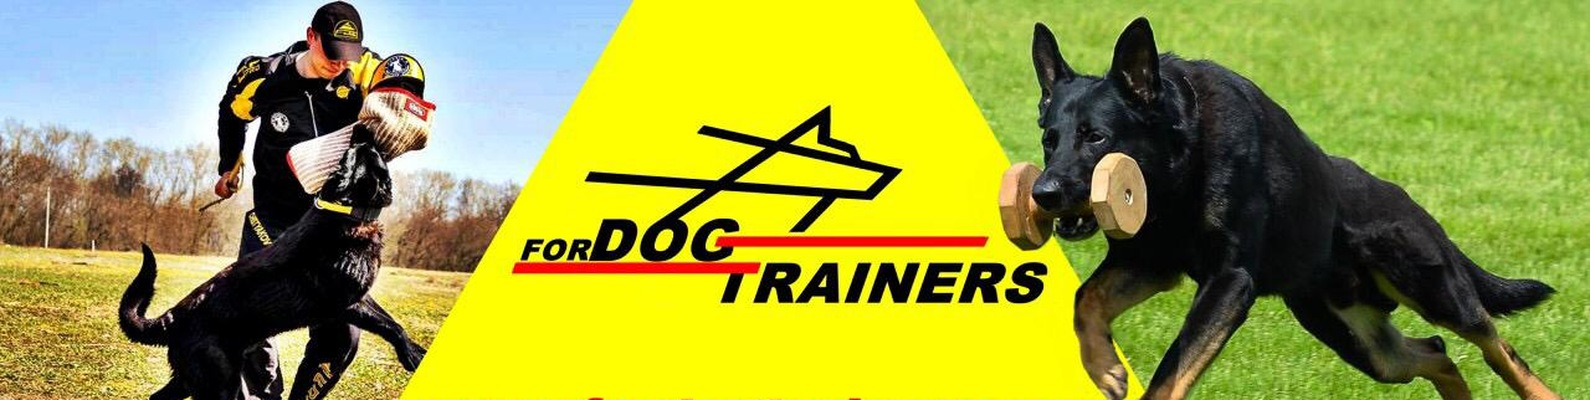 Nachrichten Hundegeschirre Store 10 besten Hundebedarfsartiklen